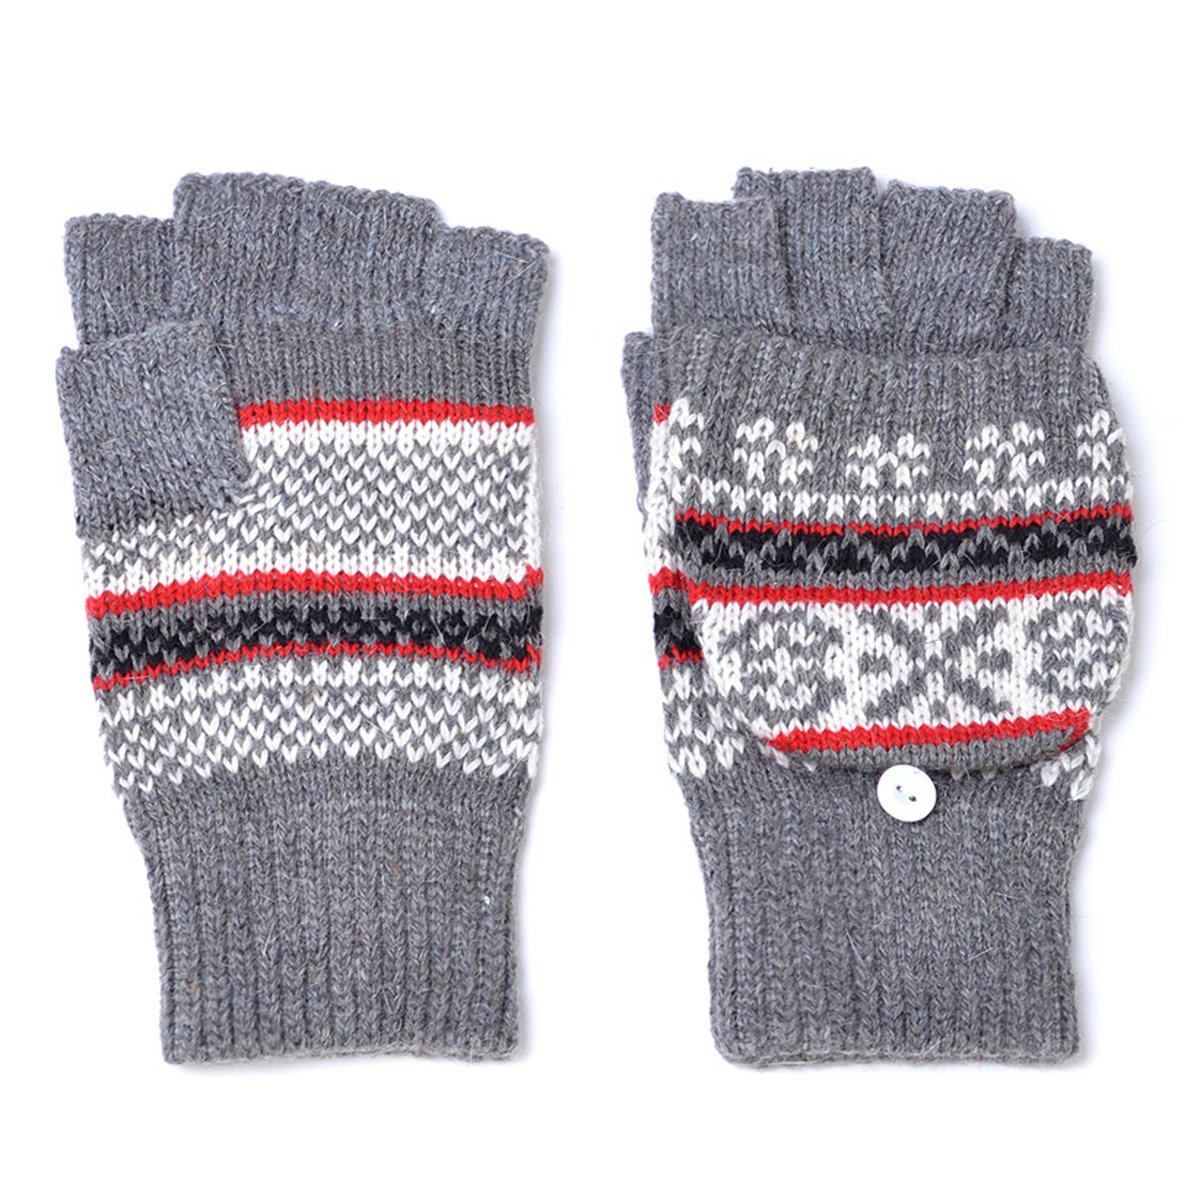 LL- Fingerless Flipover Wool Blend Womens Kids Mitten Winter Gloves Many Styles (Gray Multi Pattern)